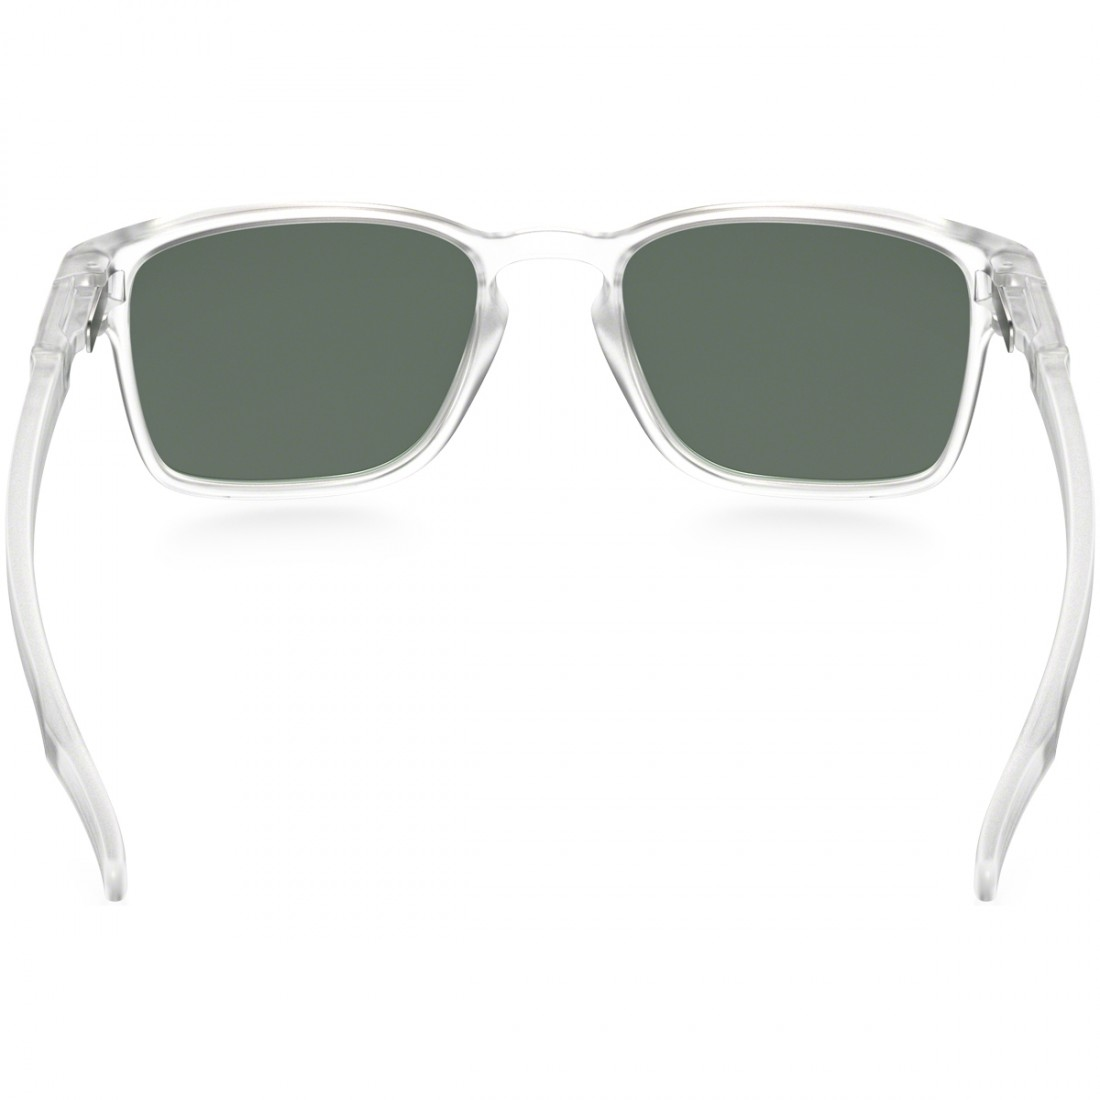 Óculos de sol OAKLEY Latch Square Matte Clear   Dark Grey · Motocard 8f99caa6a0